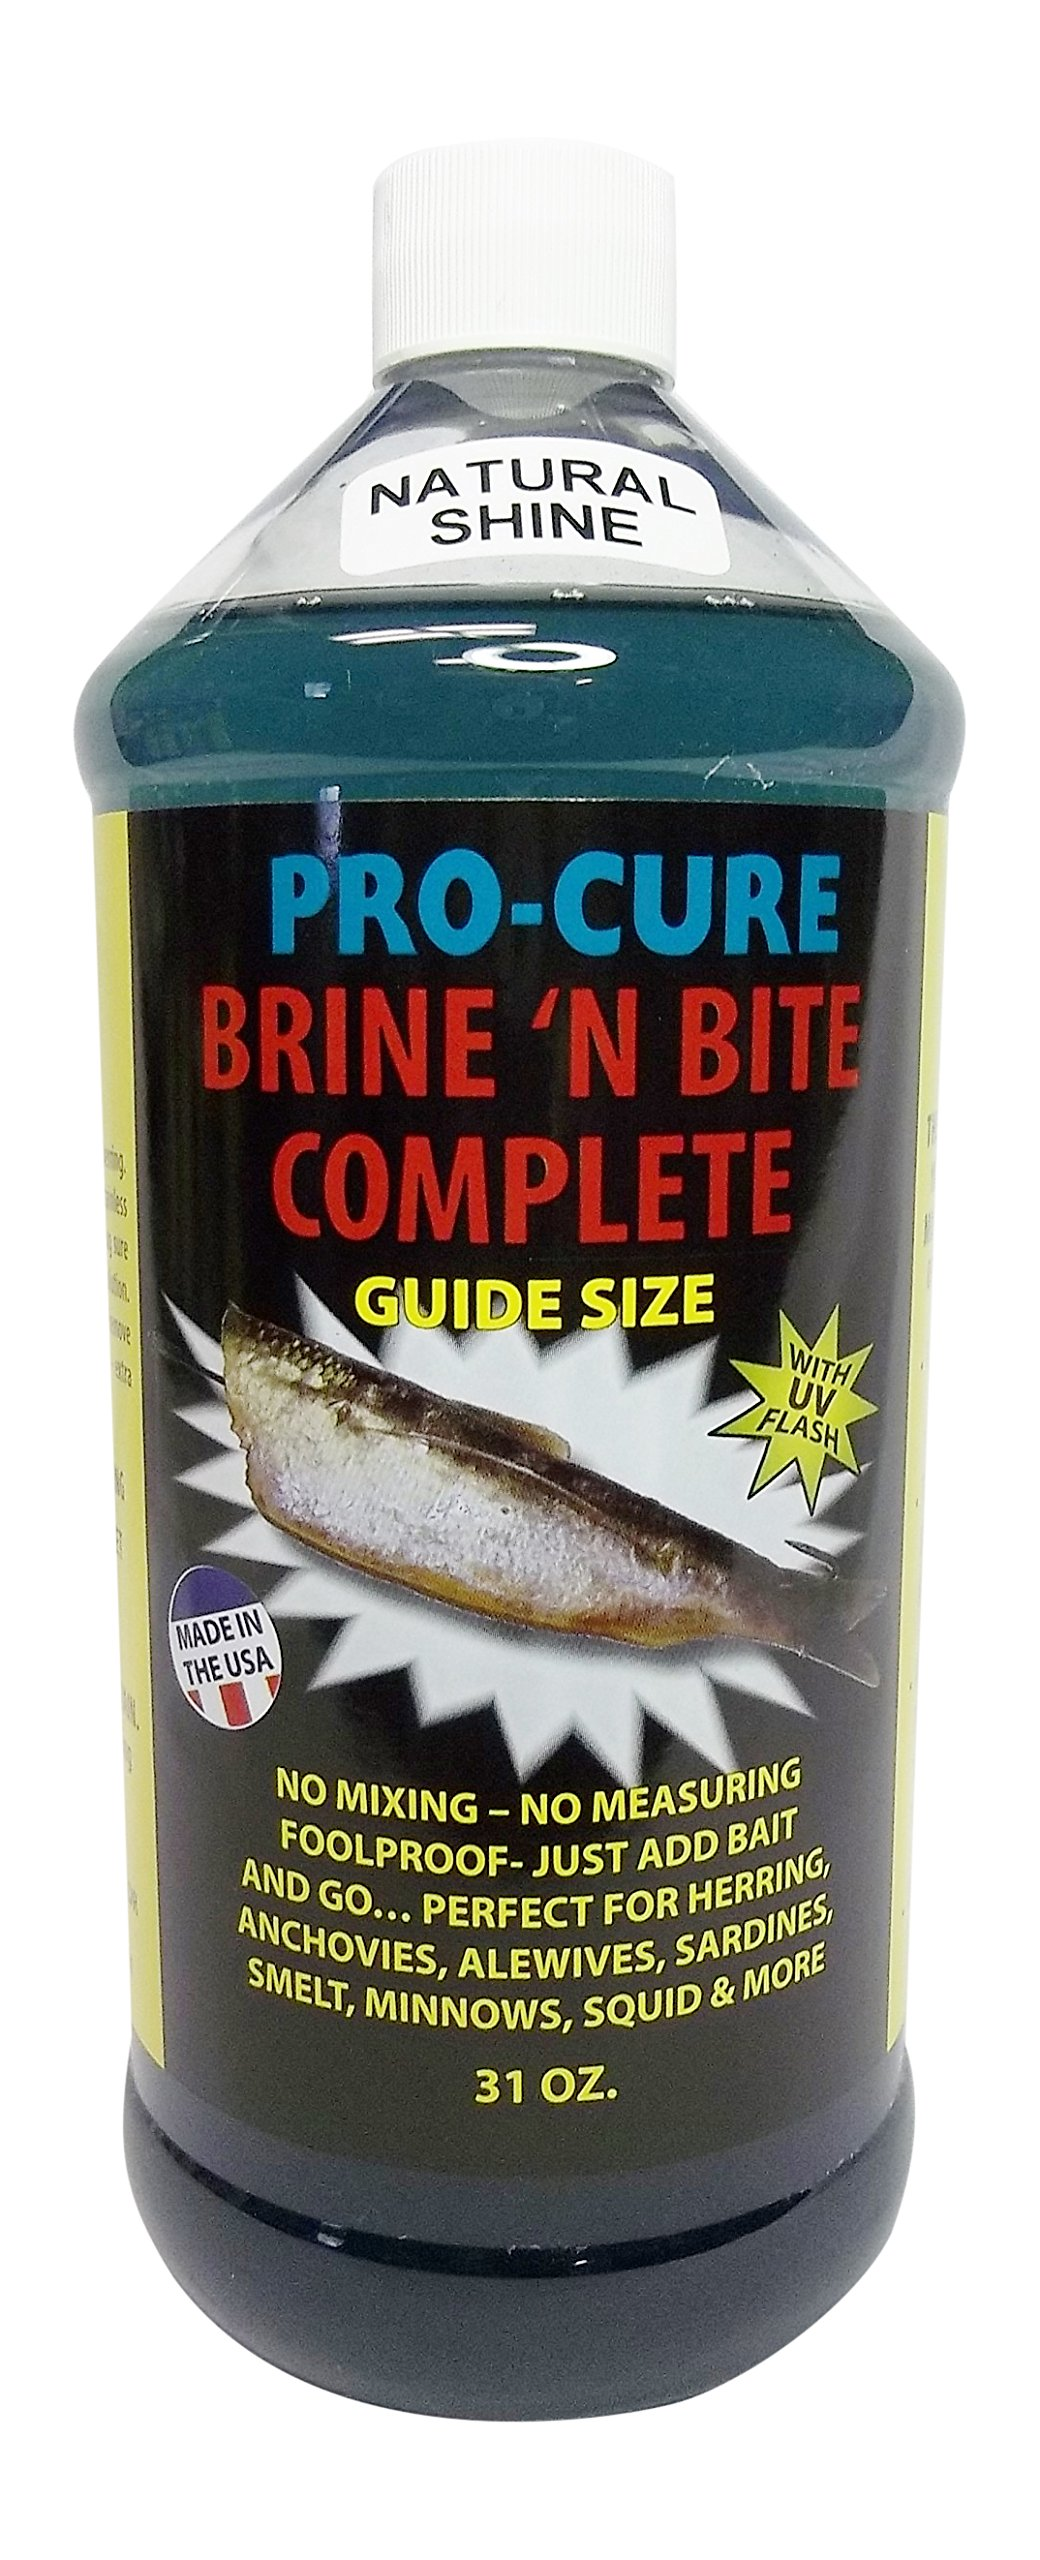 Pro Cure Brine 'N Bite Complete Bait Brine, 31 Ounce, Natural Shine